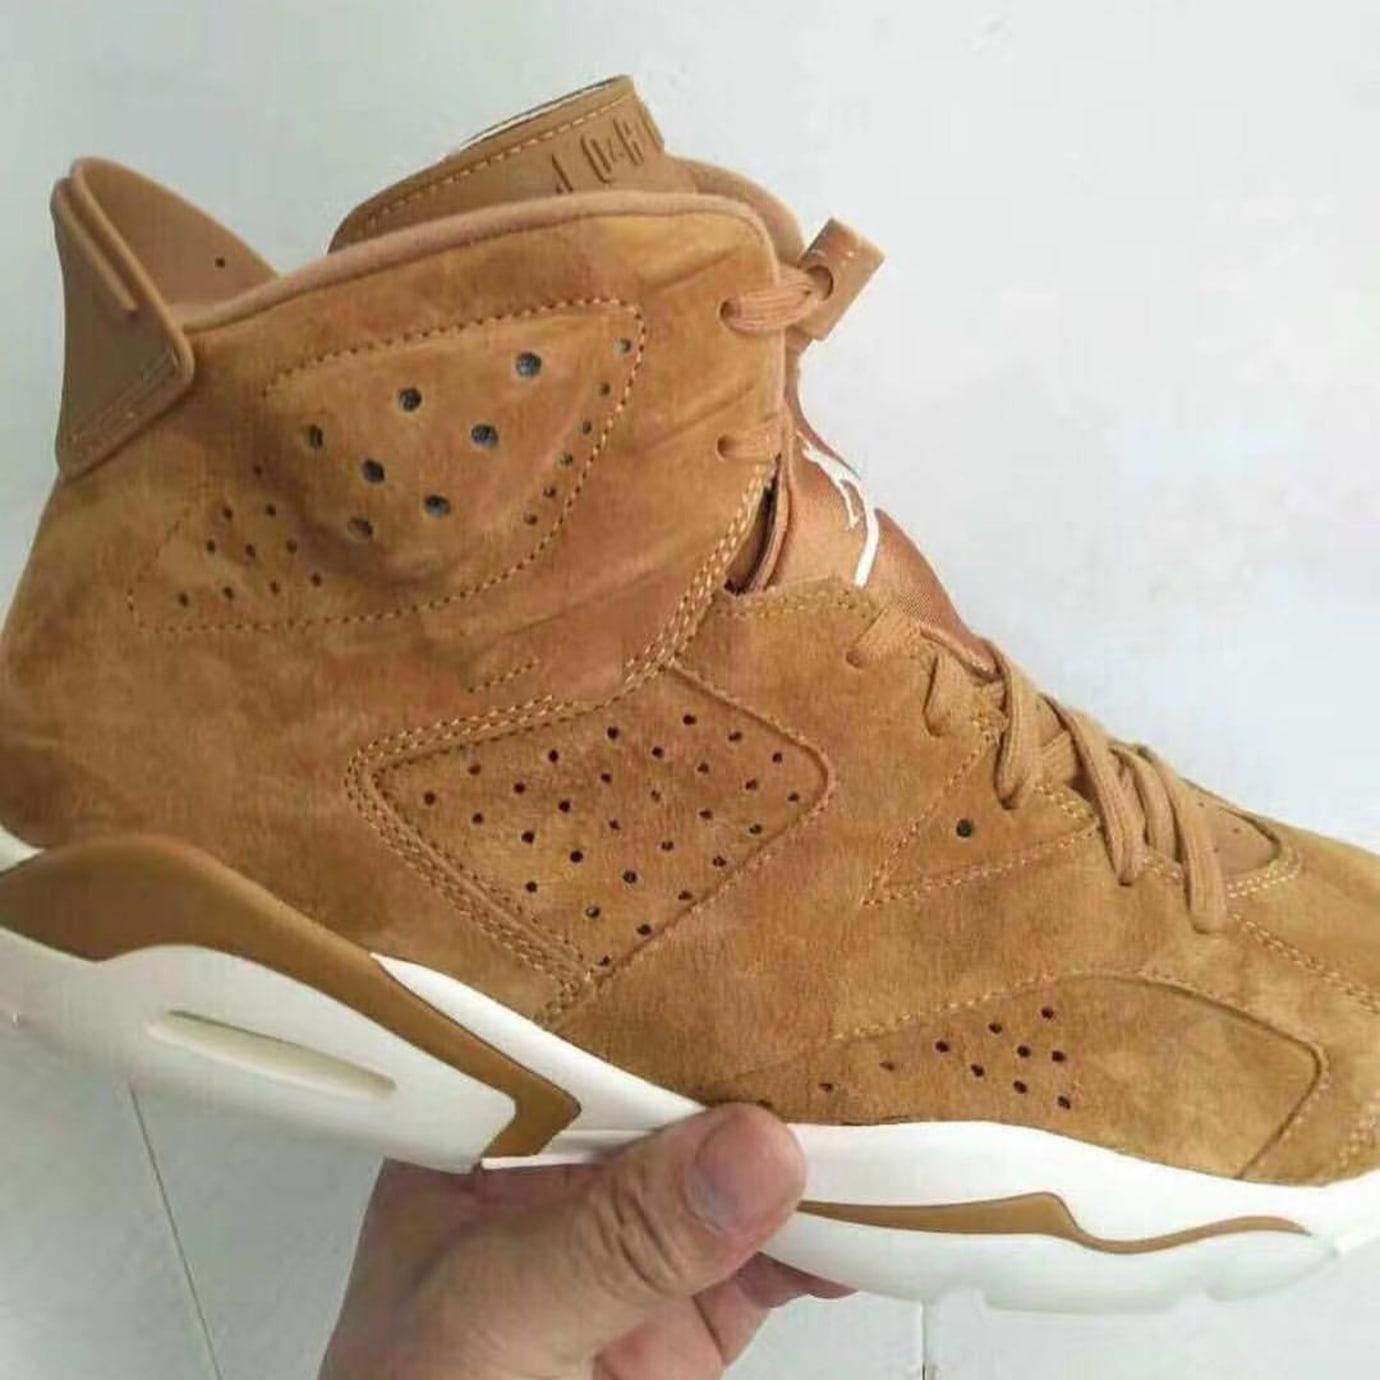 49b286ed3e0977 Air Jordan 6 Golden Harvest Wheat Release Date Profile 384664-705